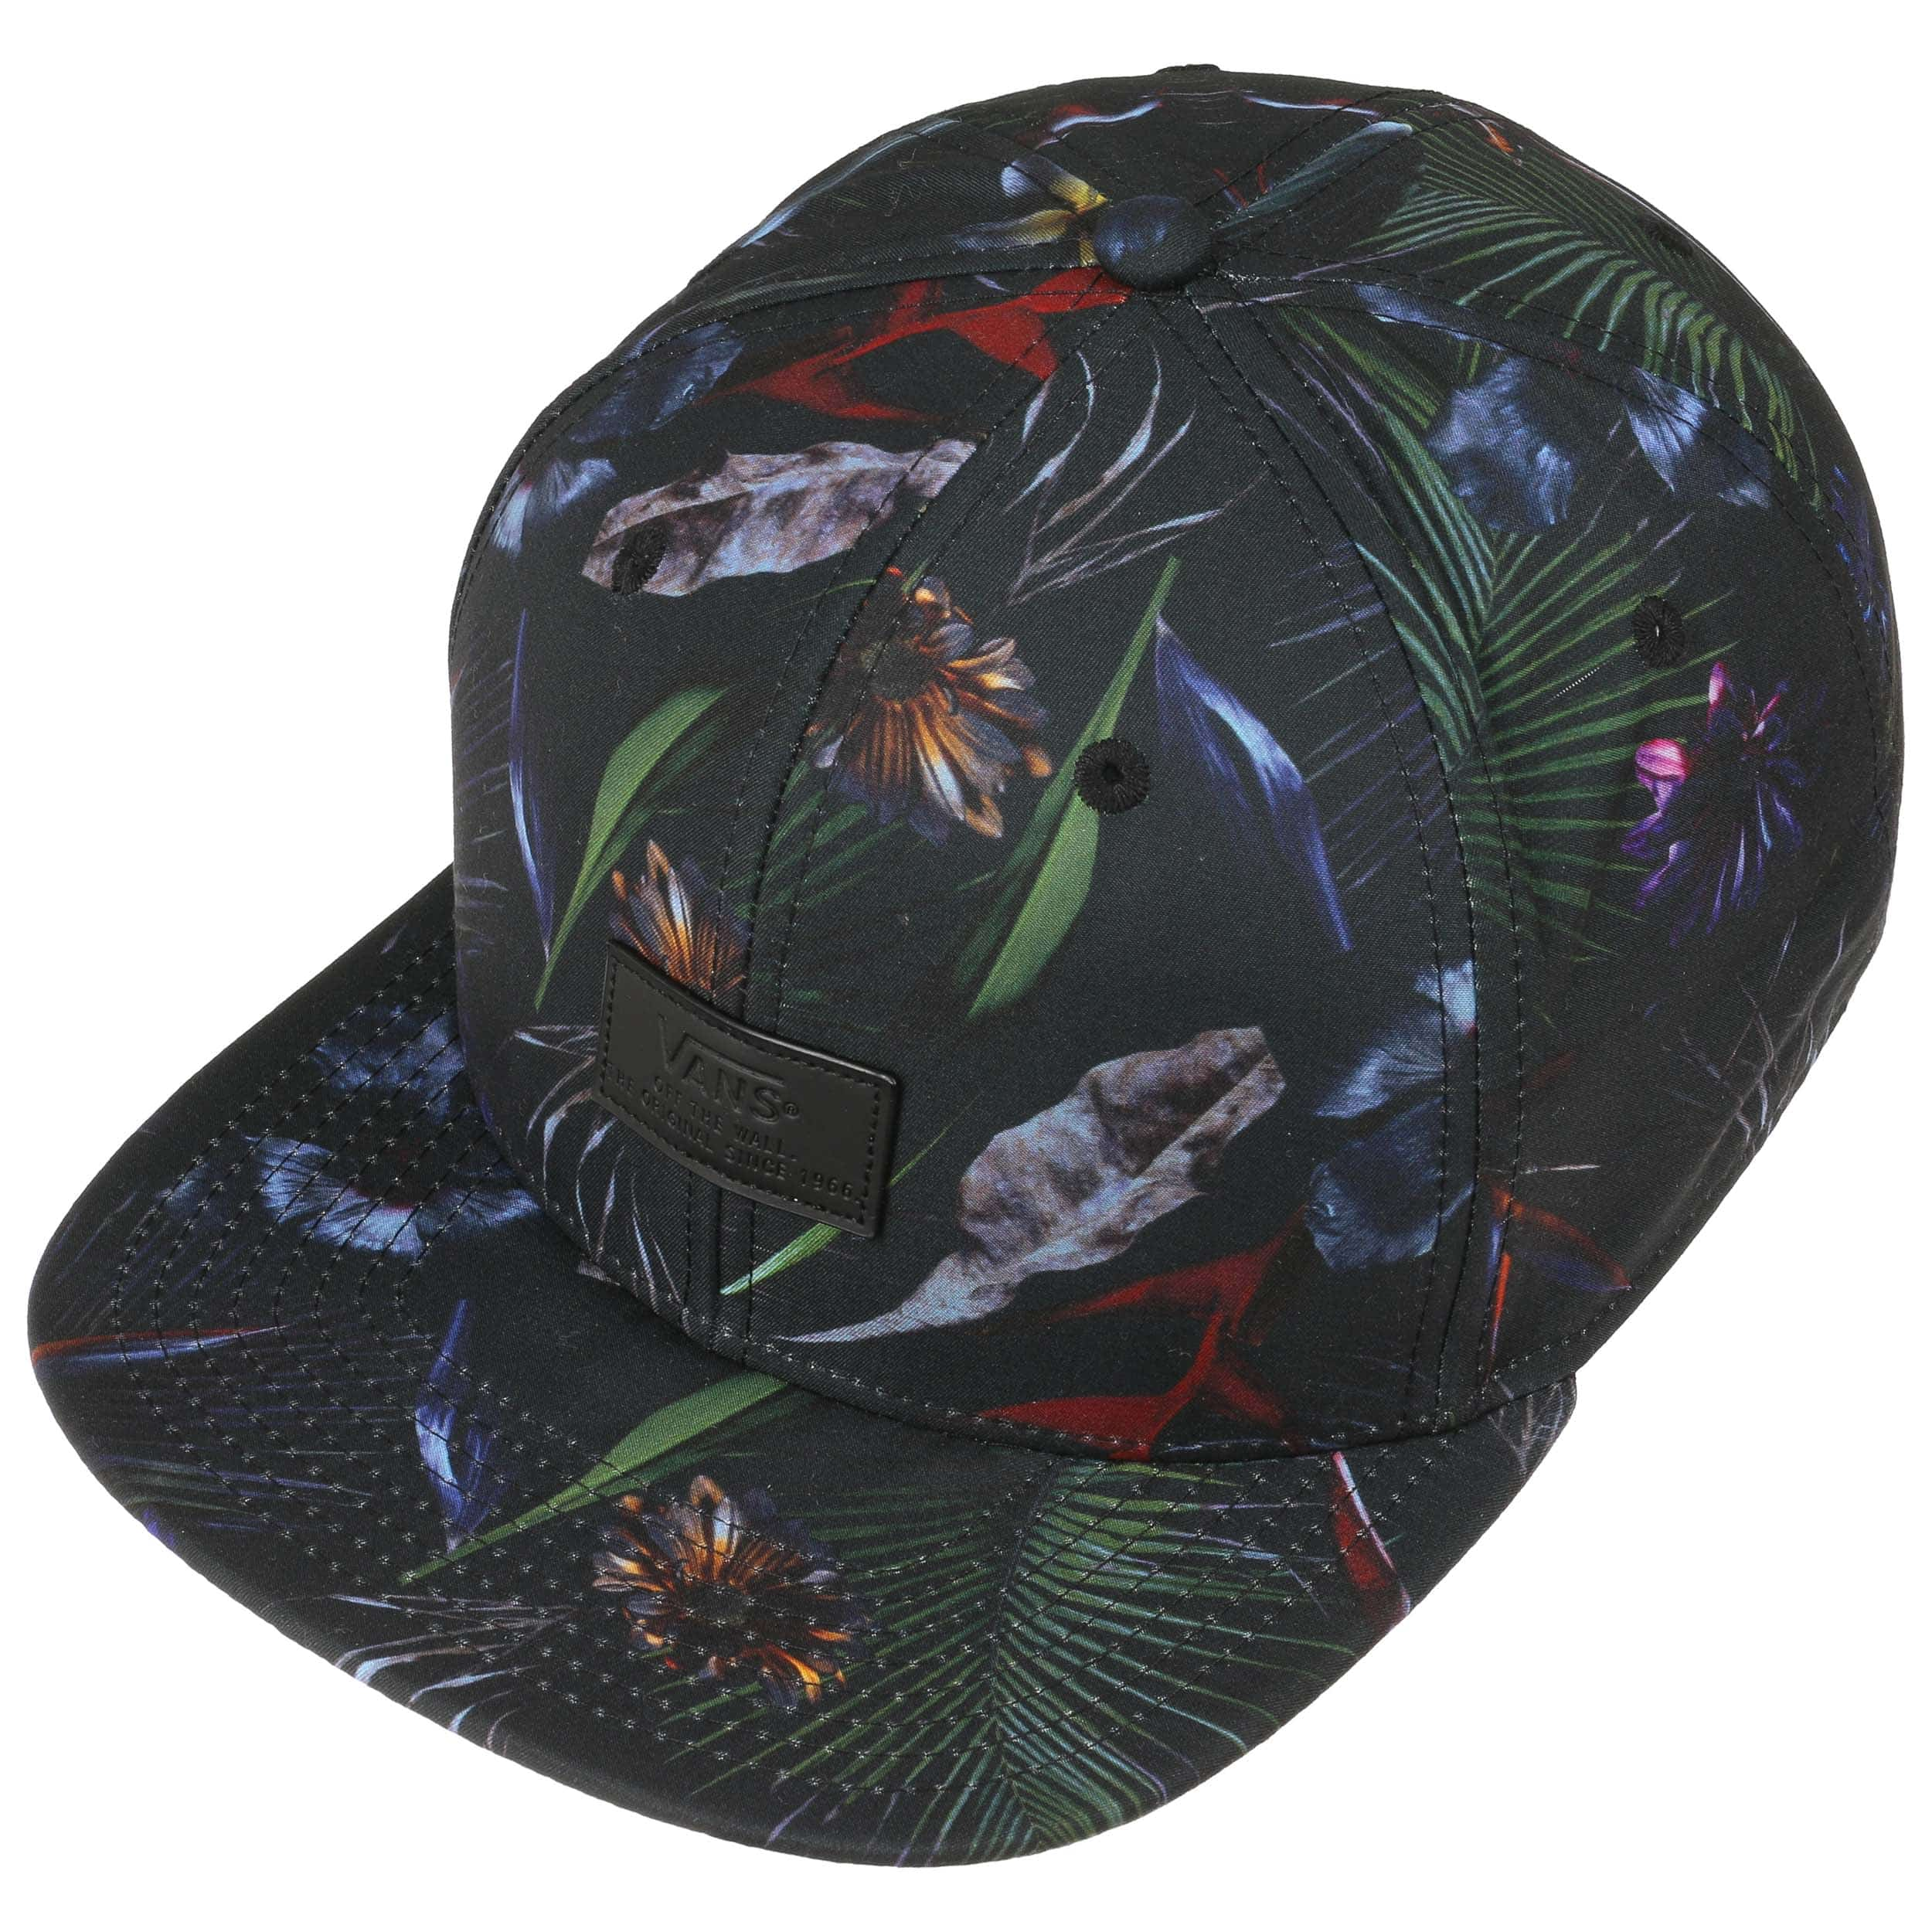 6854e08c9b92e Allover Jungle Snapback Cap by Vans - schwarz 1 ...